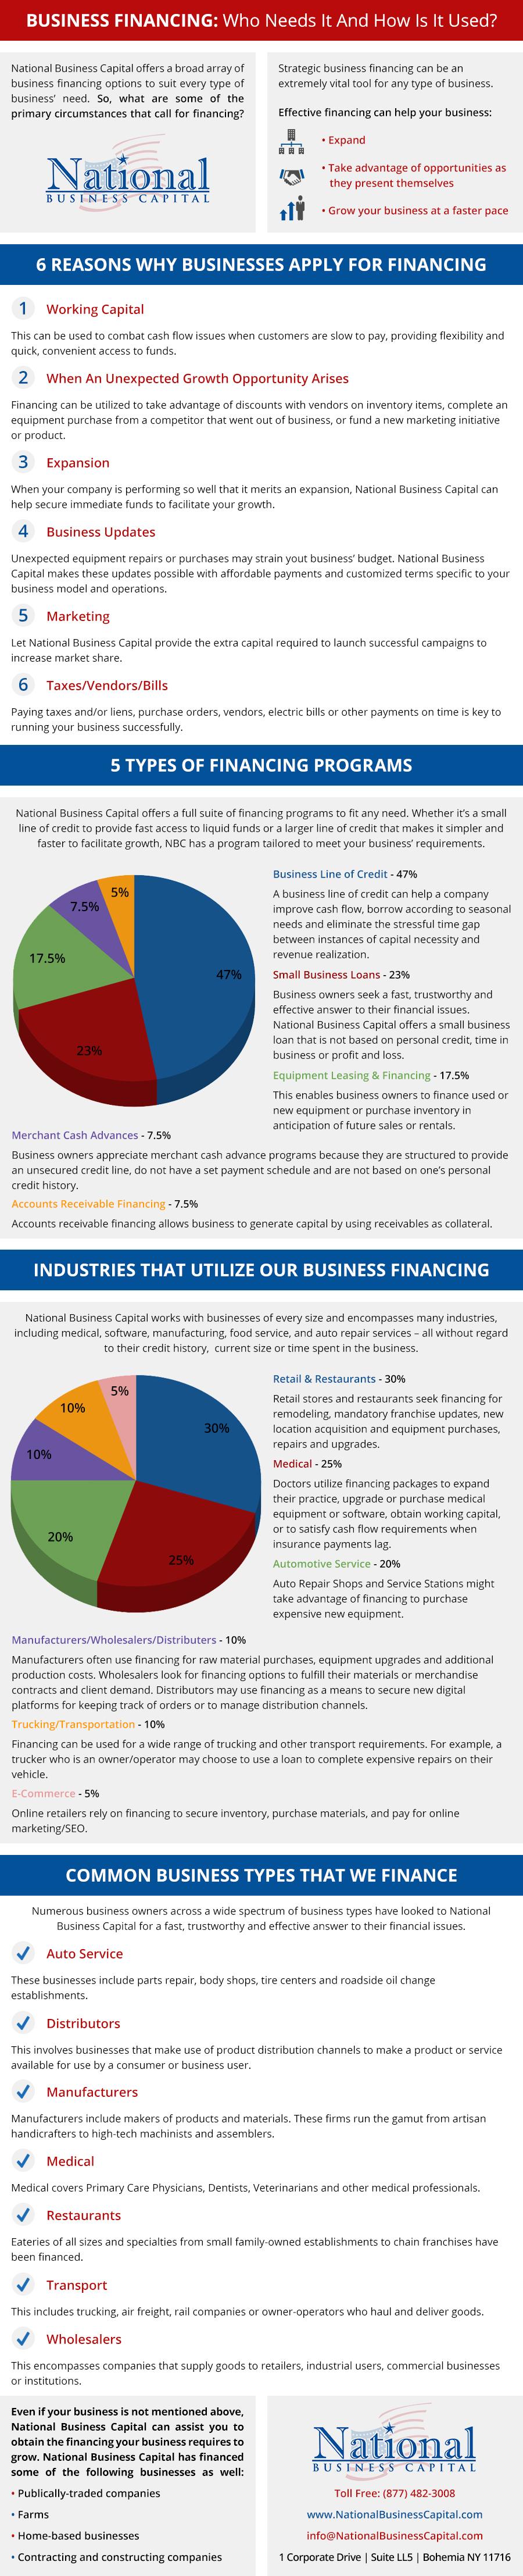 Business Financing Basics